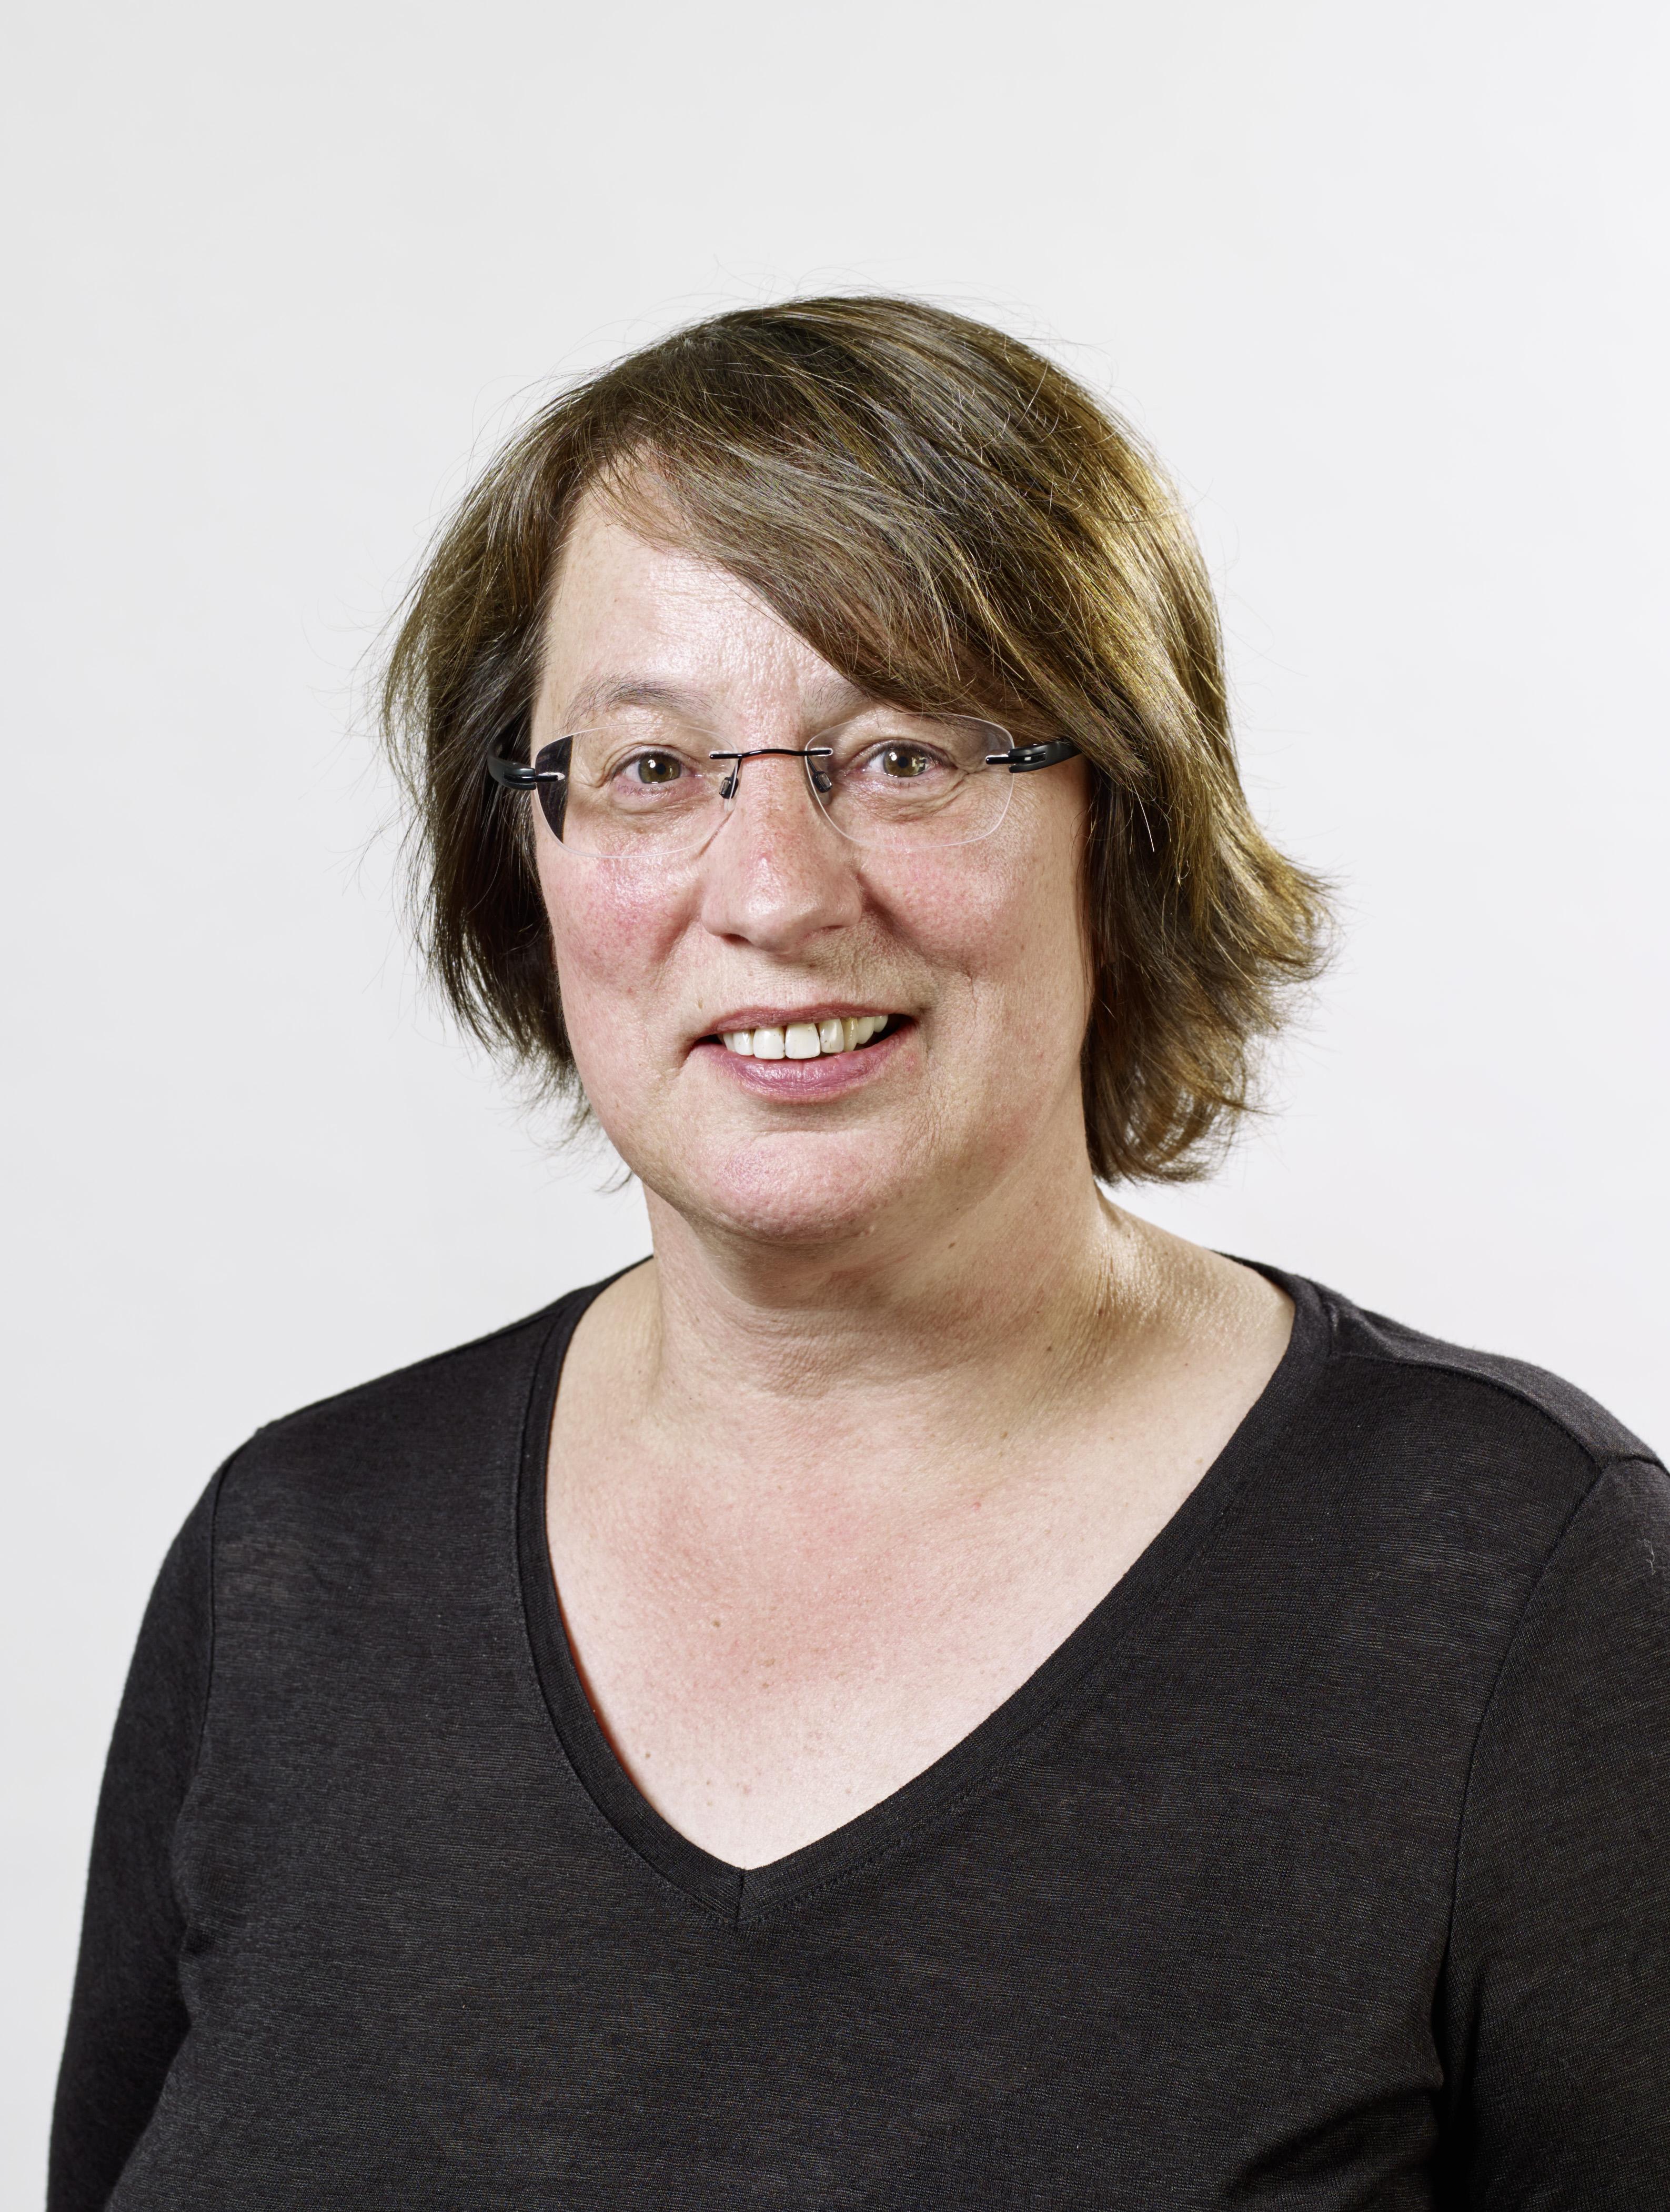 Anne Weijsenfeld